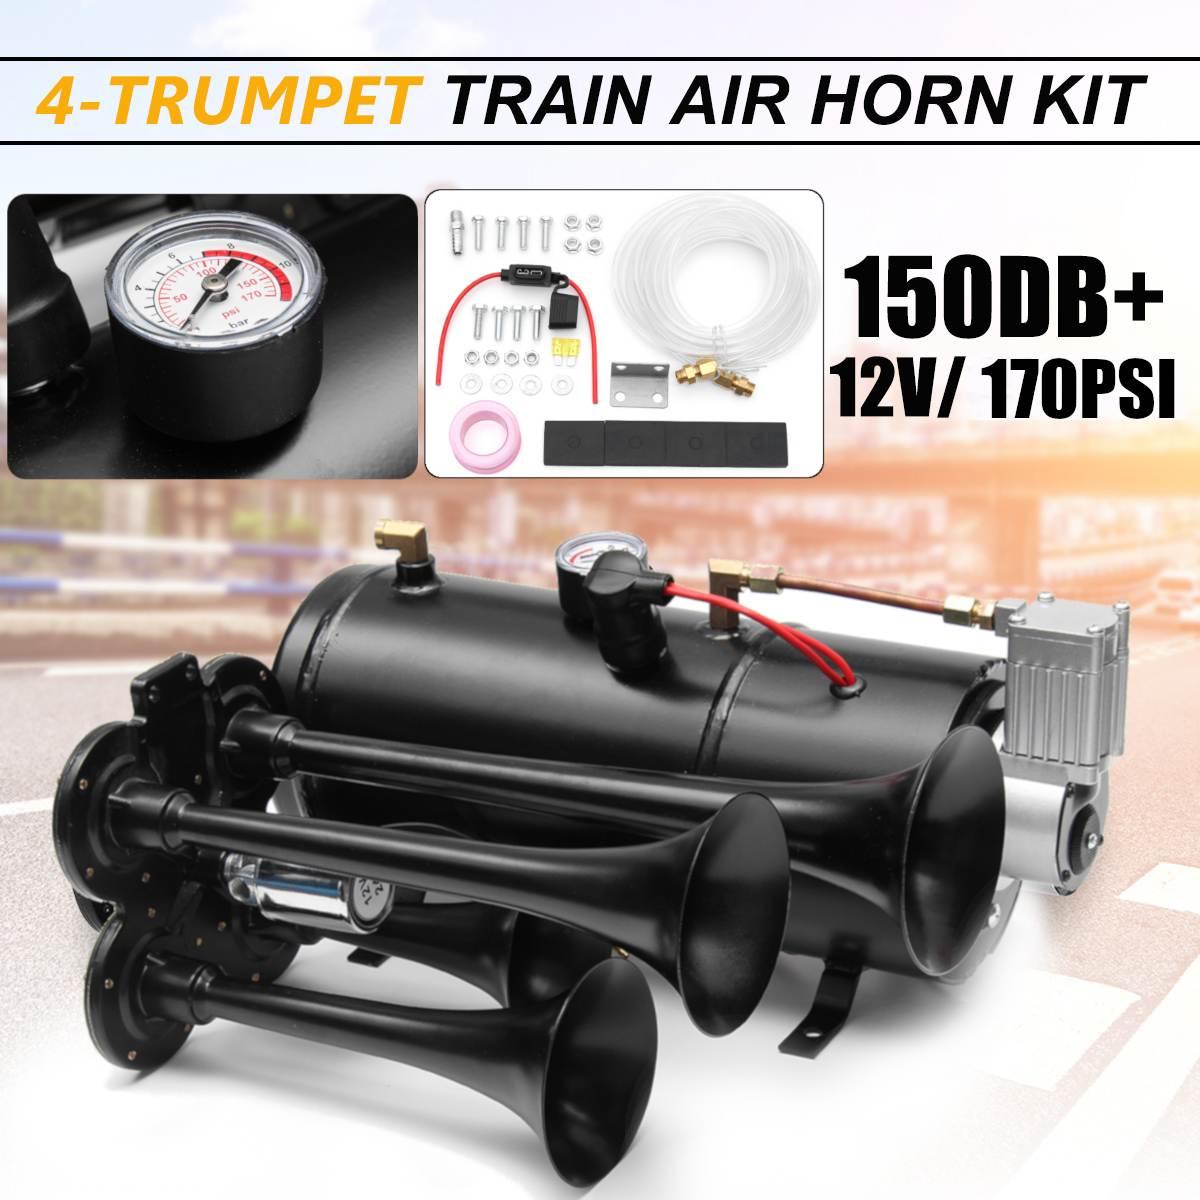 Truck Trein Quad 4 Trompet Air Horn Kit Zwart 170 Psi 12V 3Liter Compressor & Huis 150db